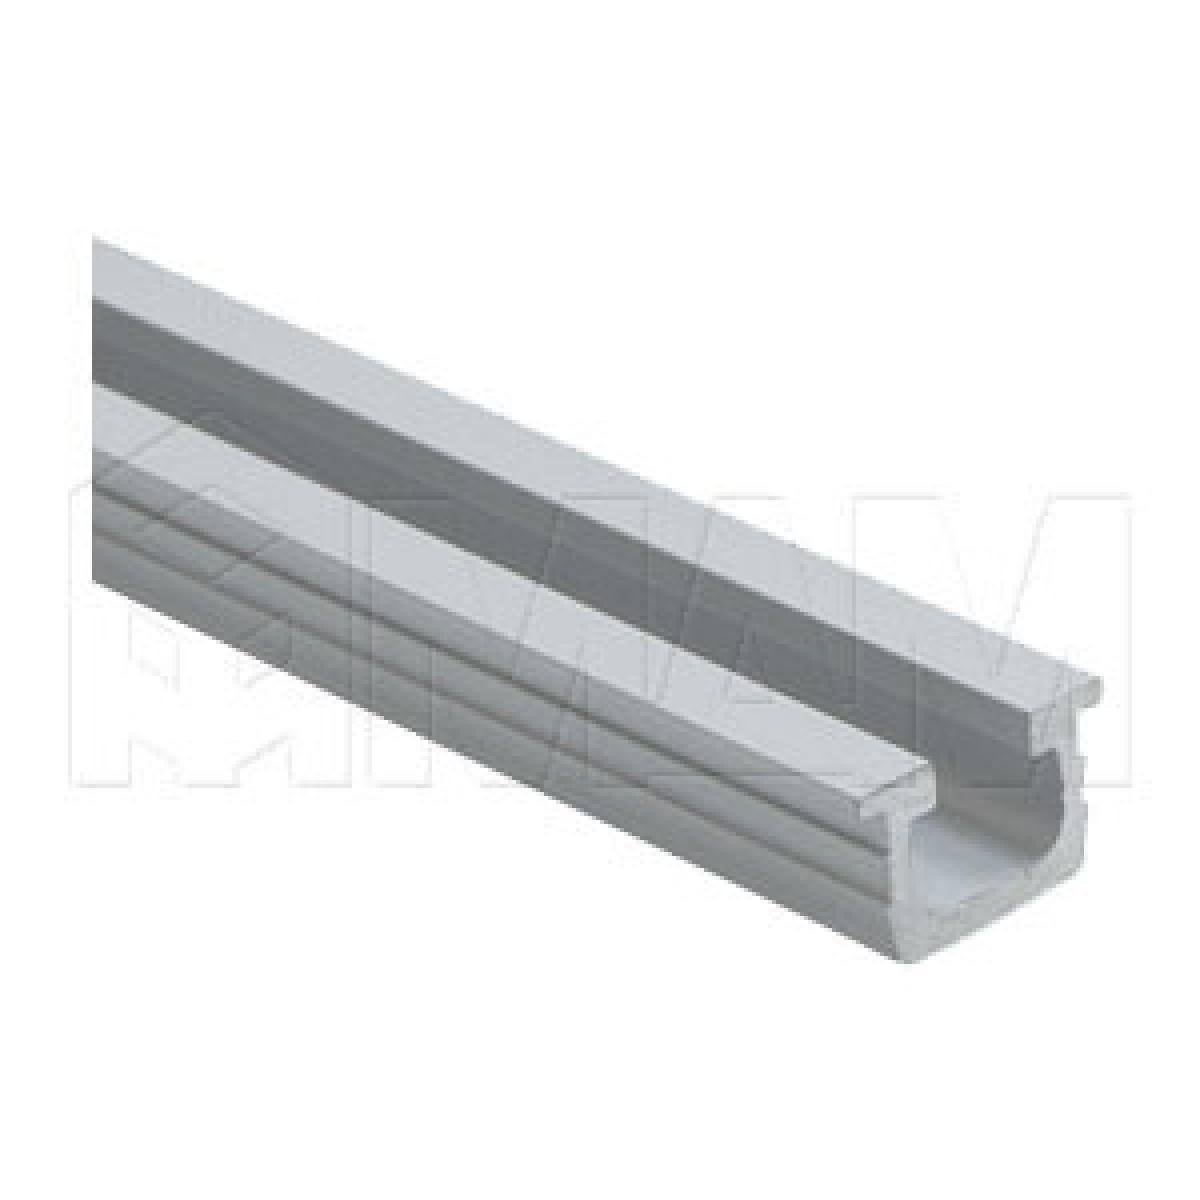 PS03 Направляющая верх/низ, серебро анодир., L-1132